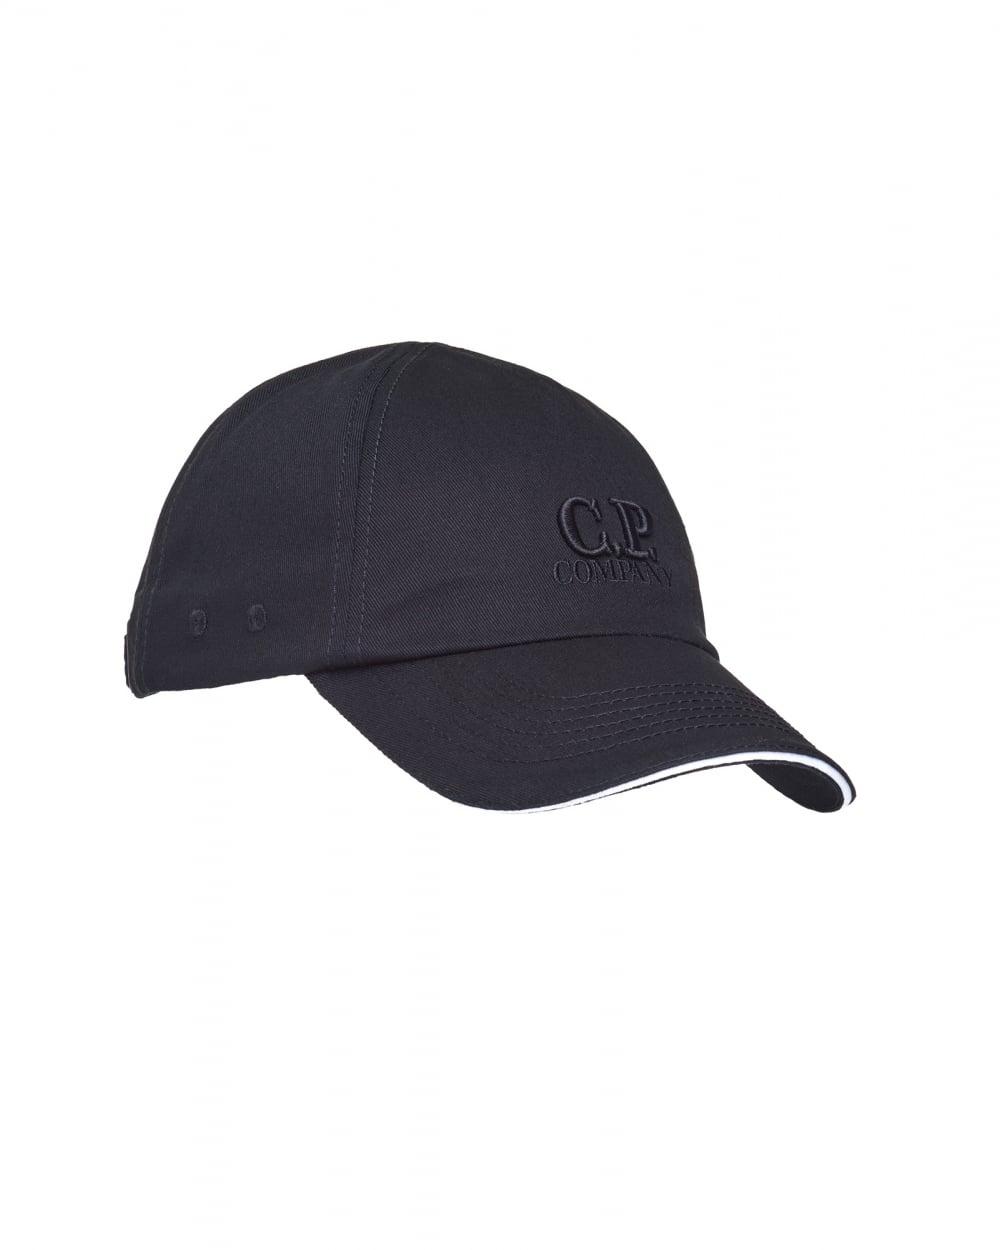 82a9073b C.P. Company Mens Logo Baseball Cap, Cotton Black Hat